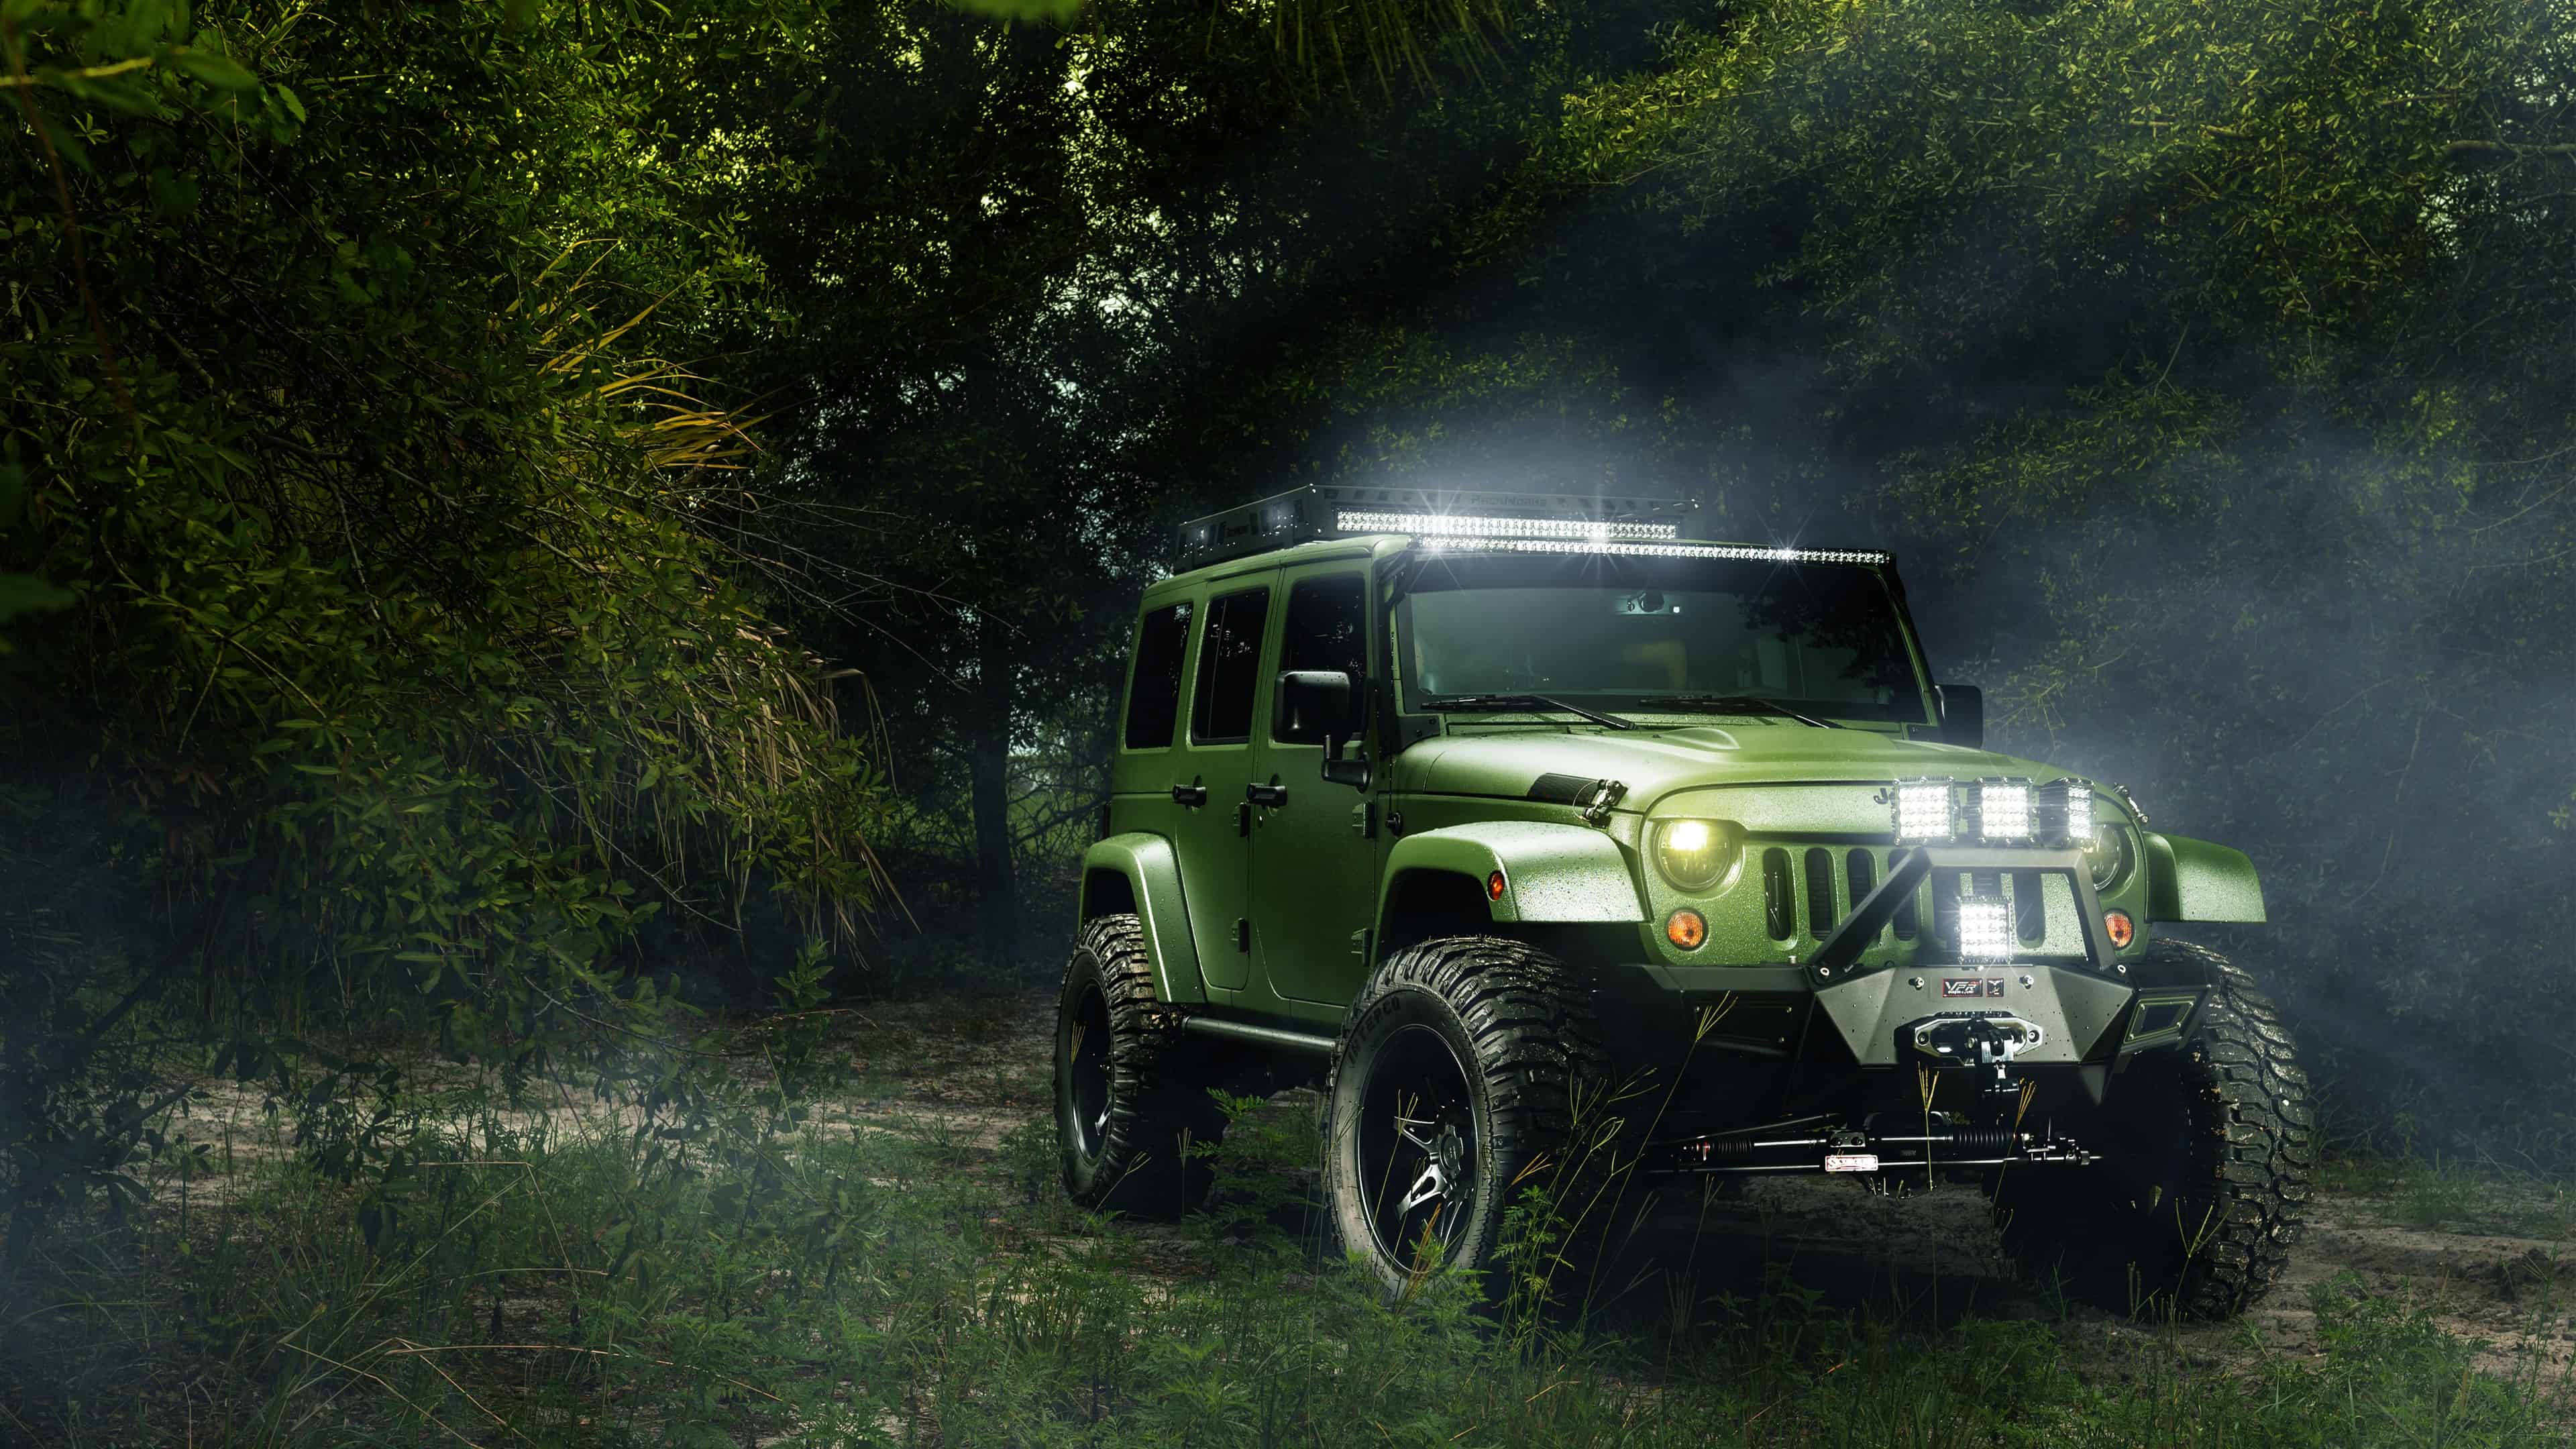 Jeep Wrangler Uhd 4k Wallpaper Pixelz